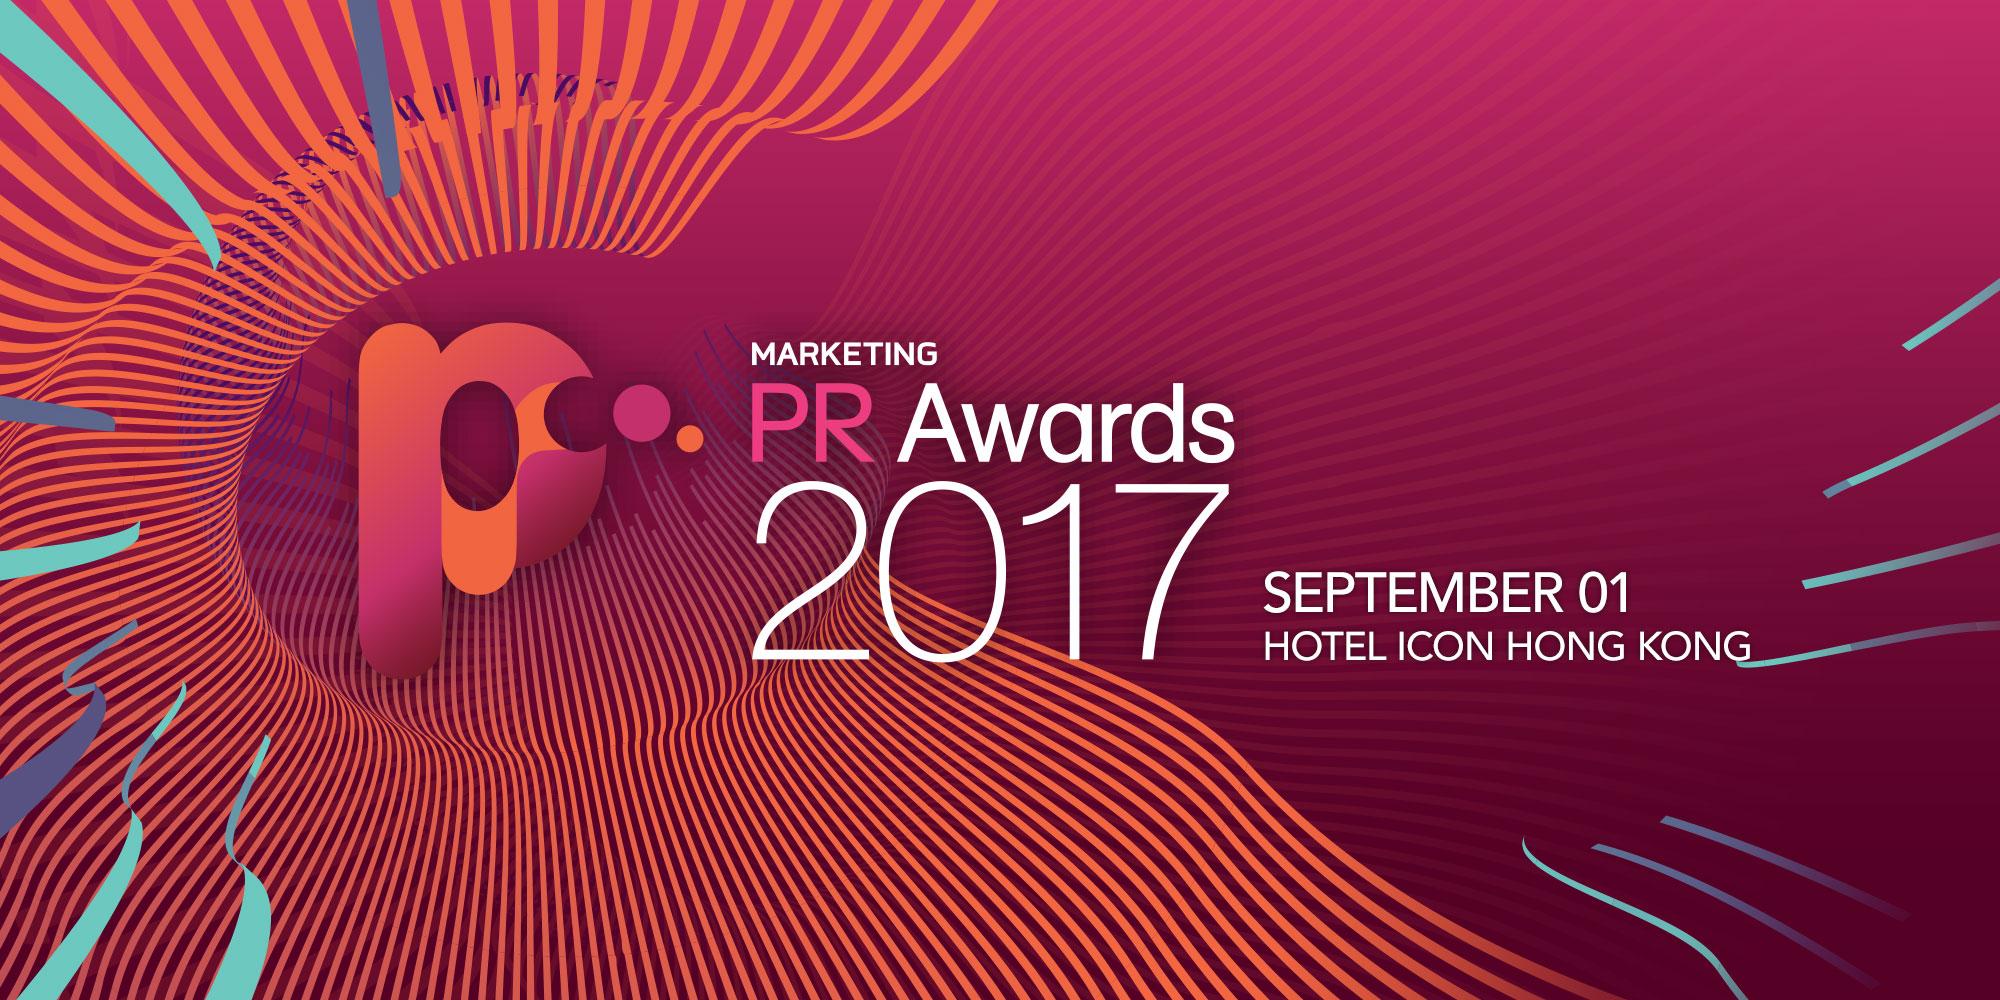 PR Awards 2017